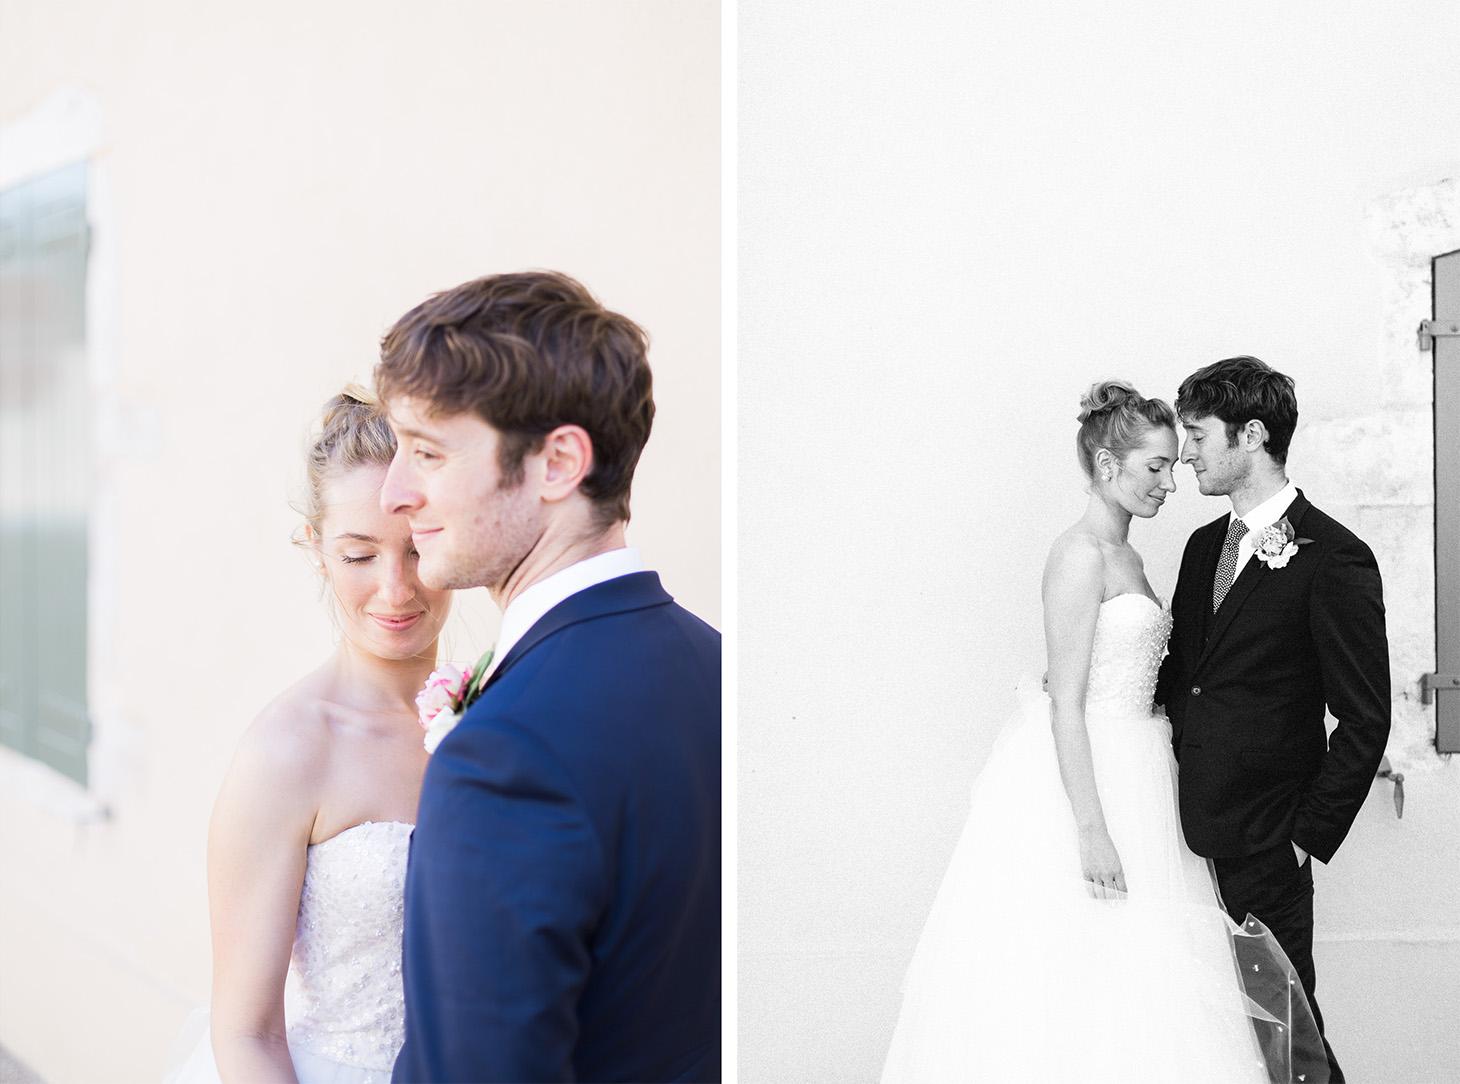 bourgogne_wedding_photographer_chateau_pommard-040 copie